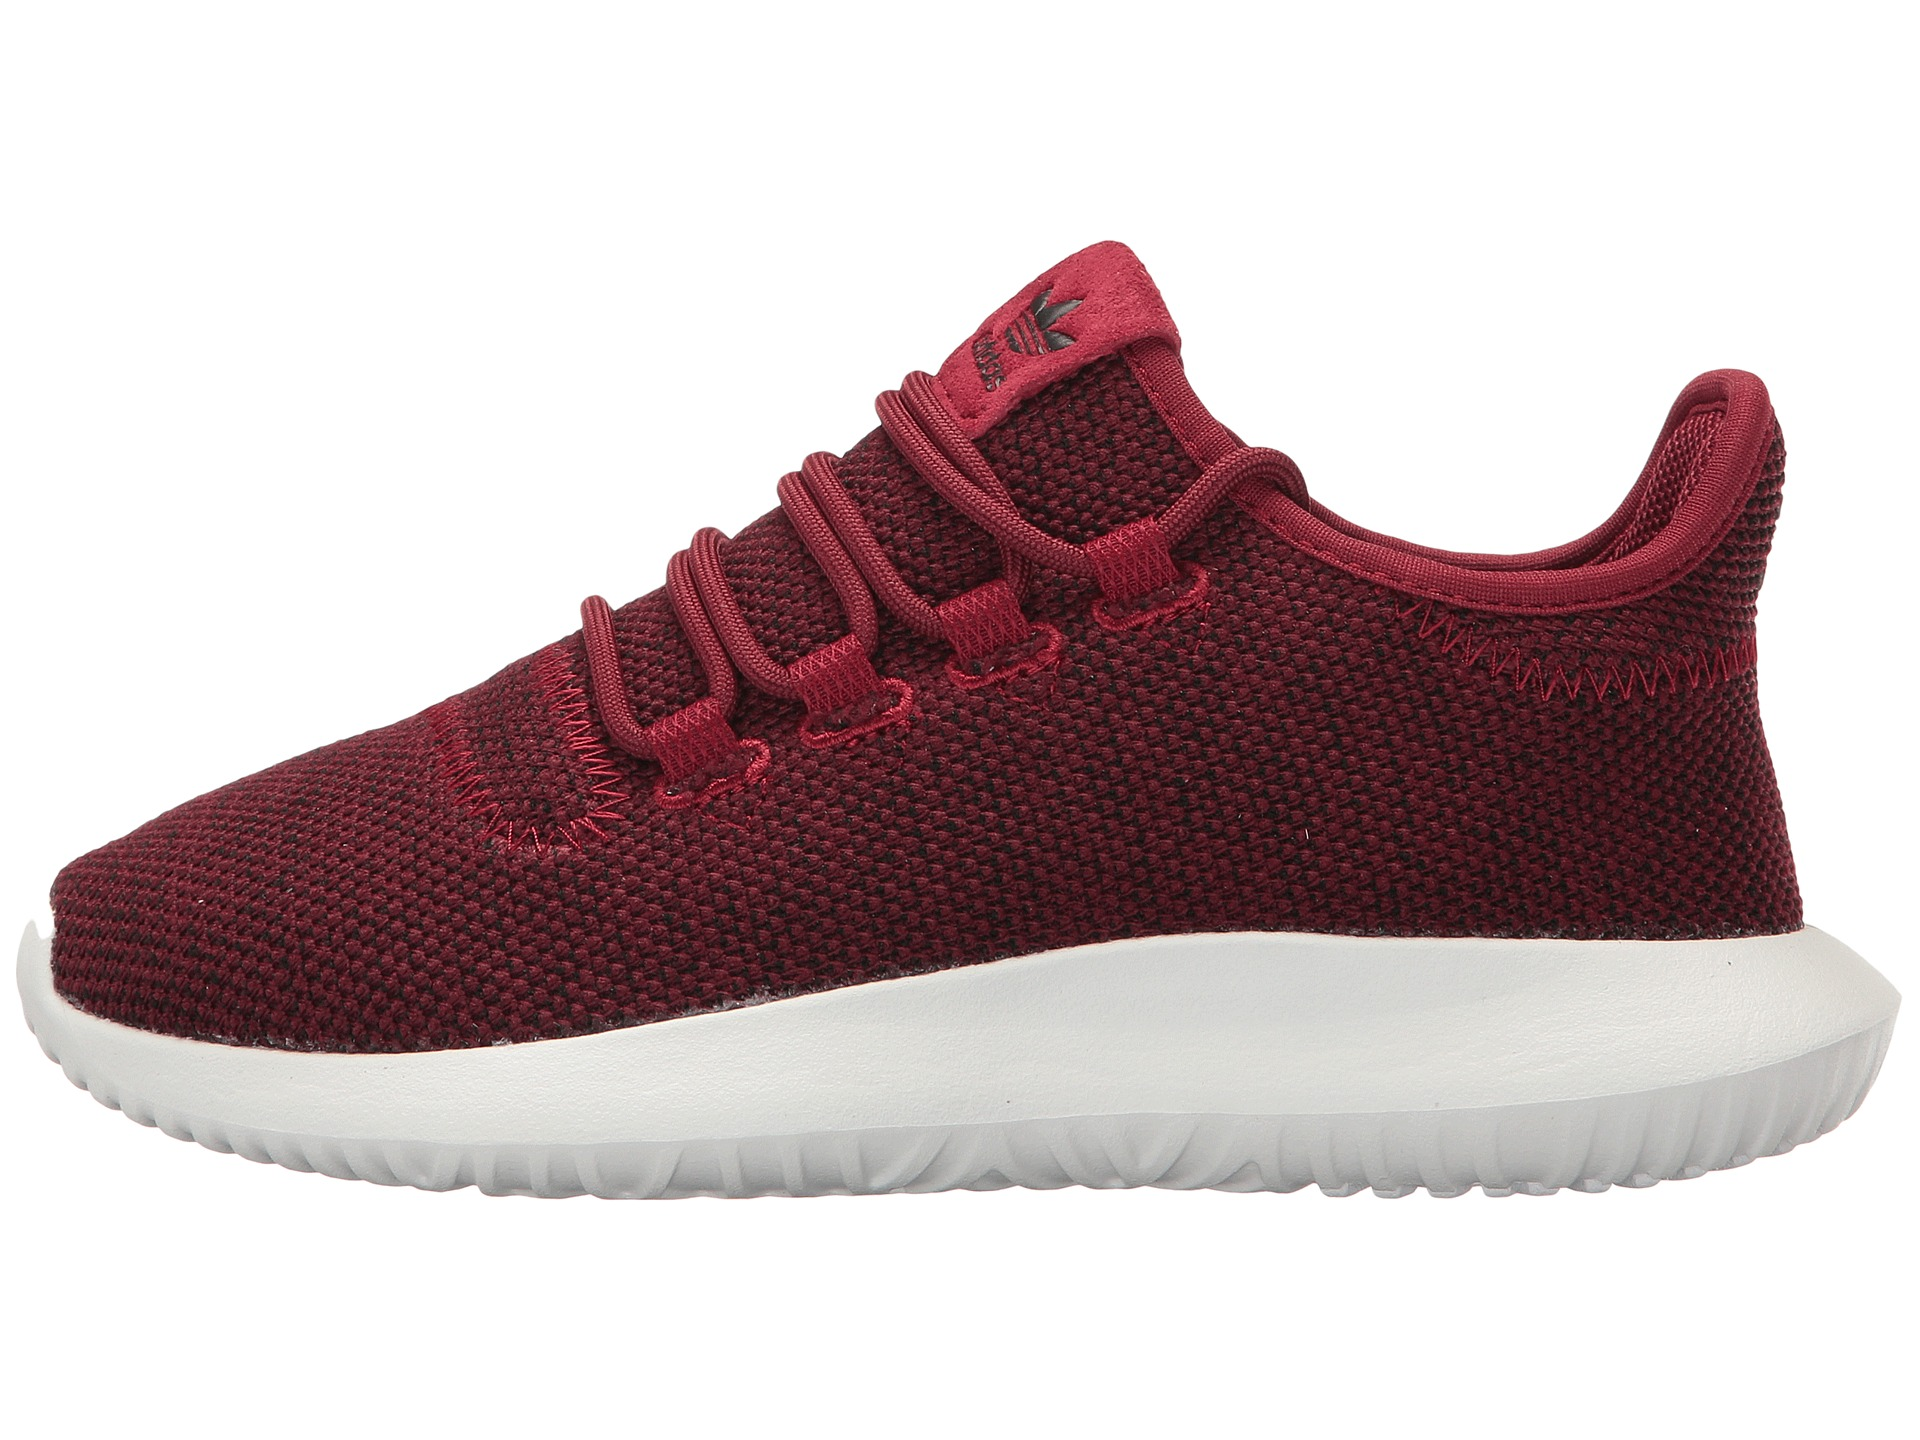 buy online 04dff dc995 adidas tubular zappos